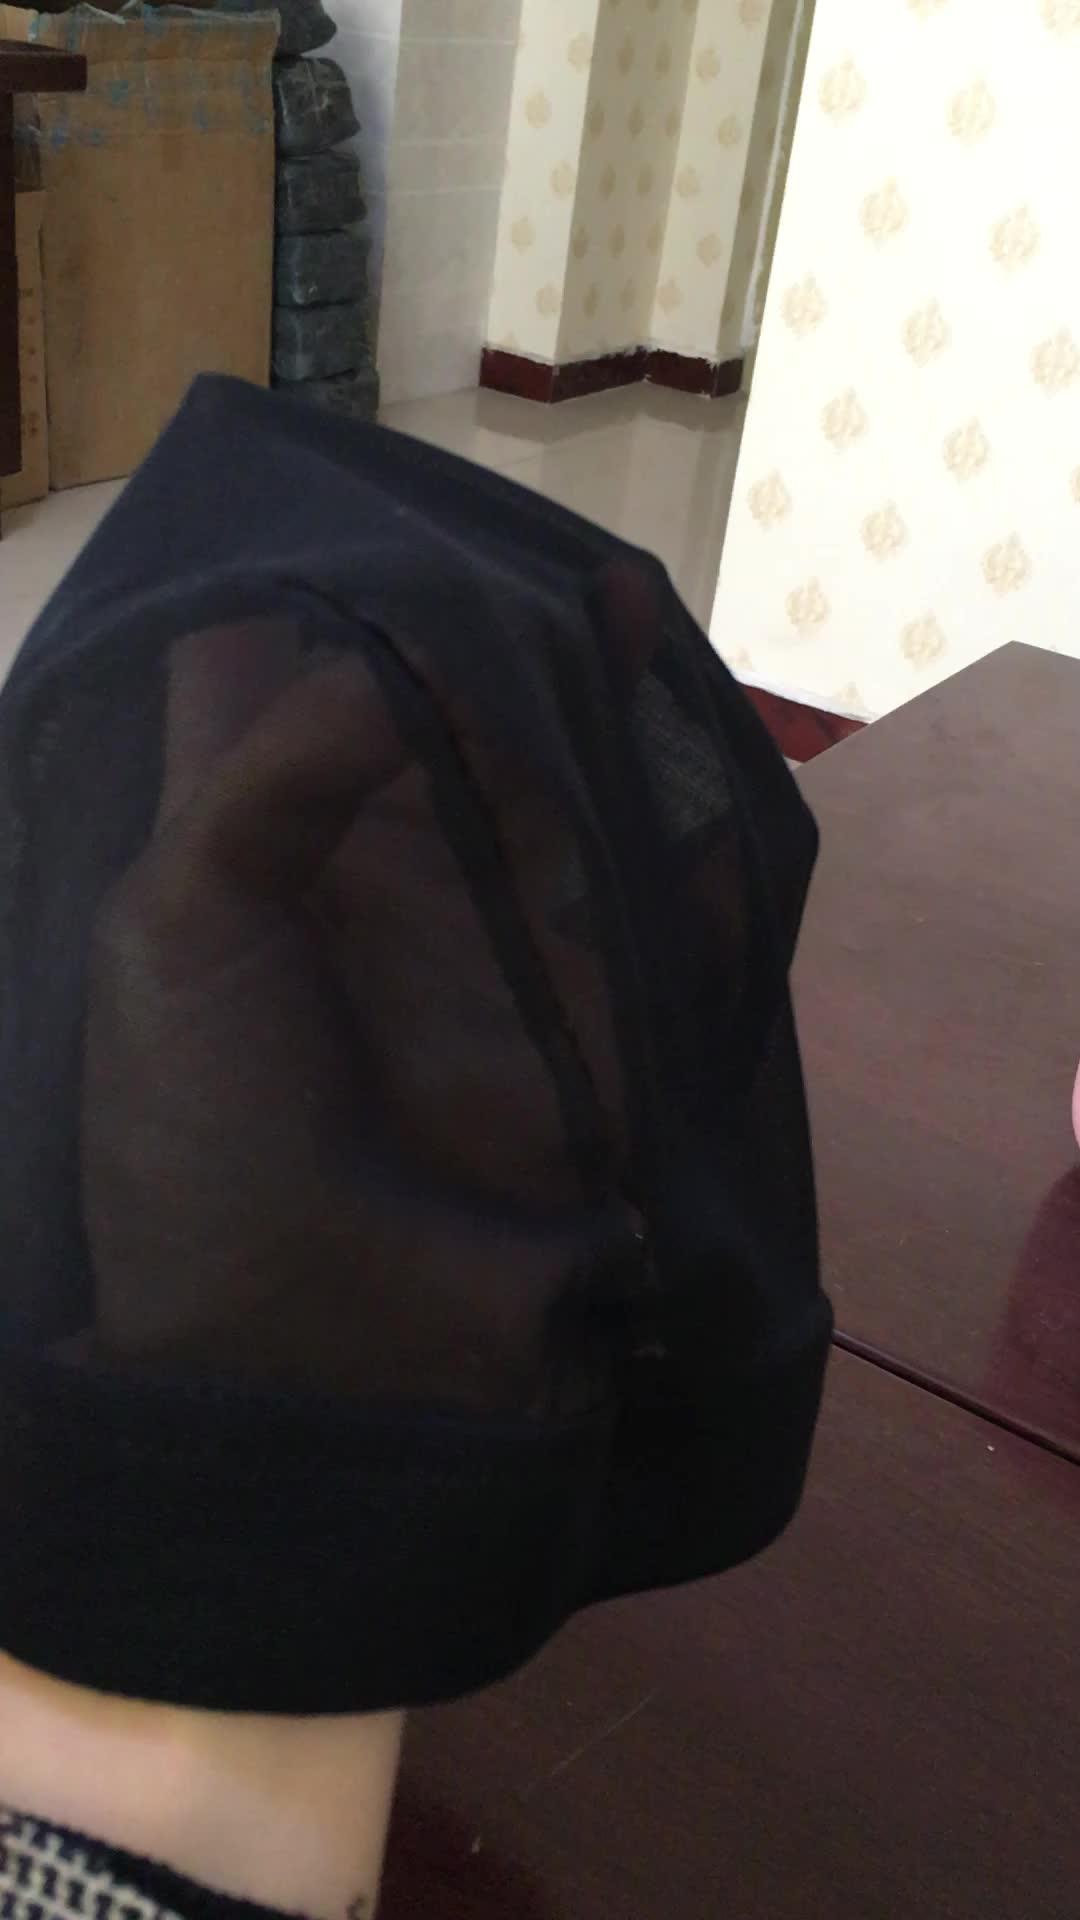 Wig Hairnet Unisex Stocking Wig Stockings Cap, Nylon Stretch Mesh Lace Wig Caps